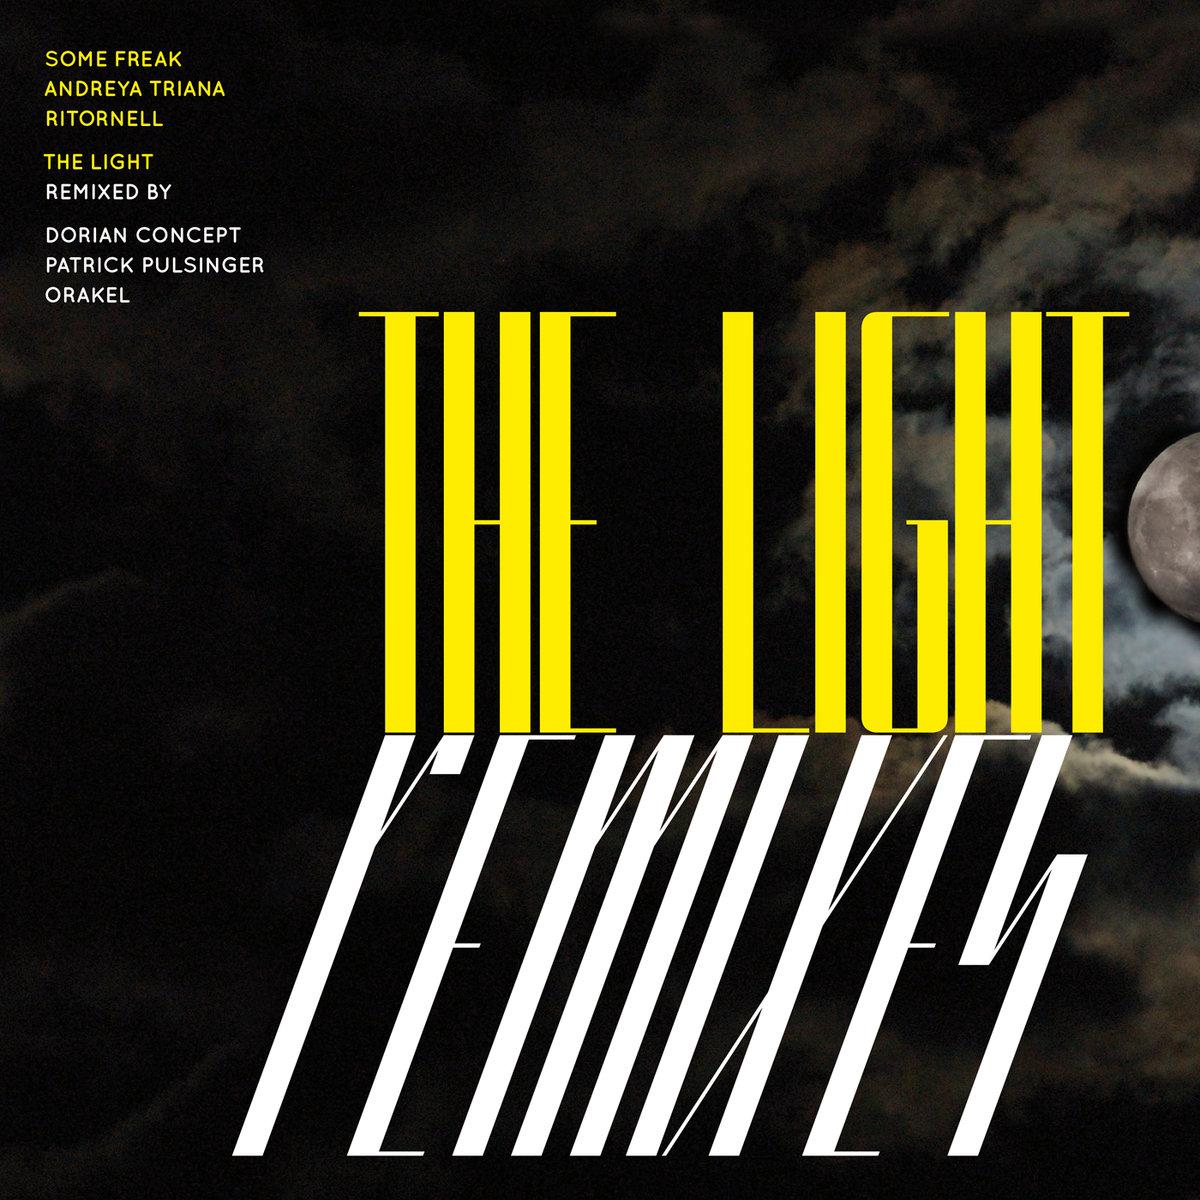 The Light (Dorian Concept Remix)